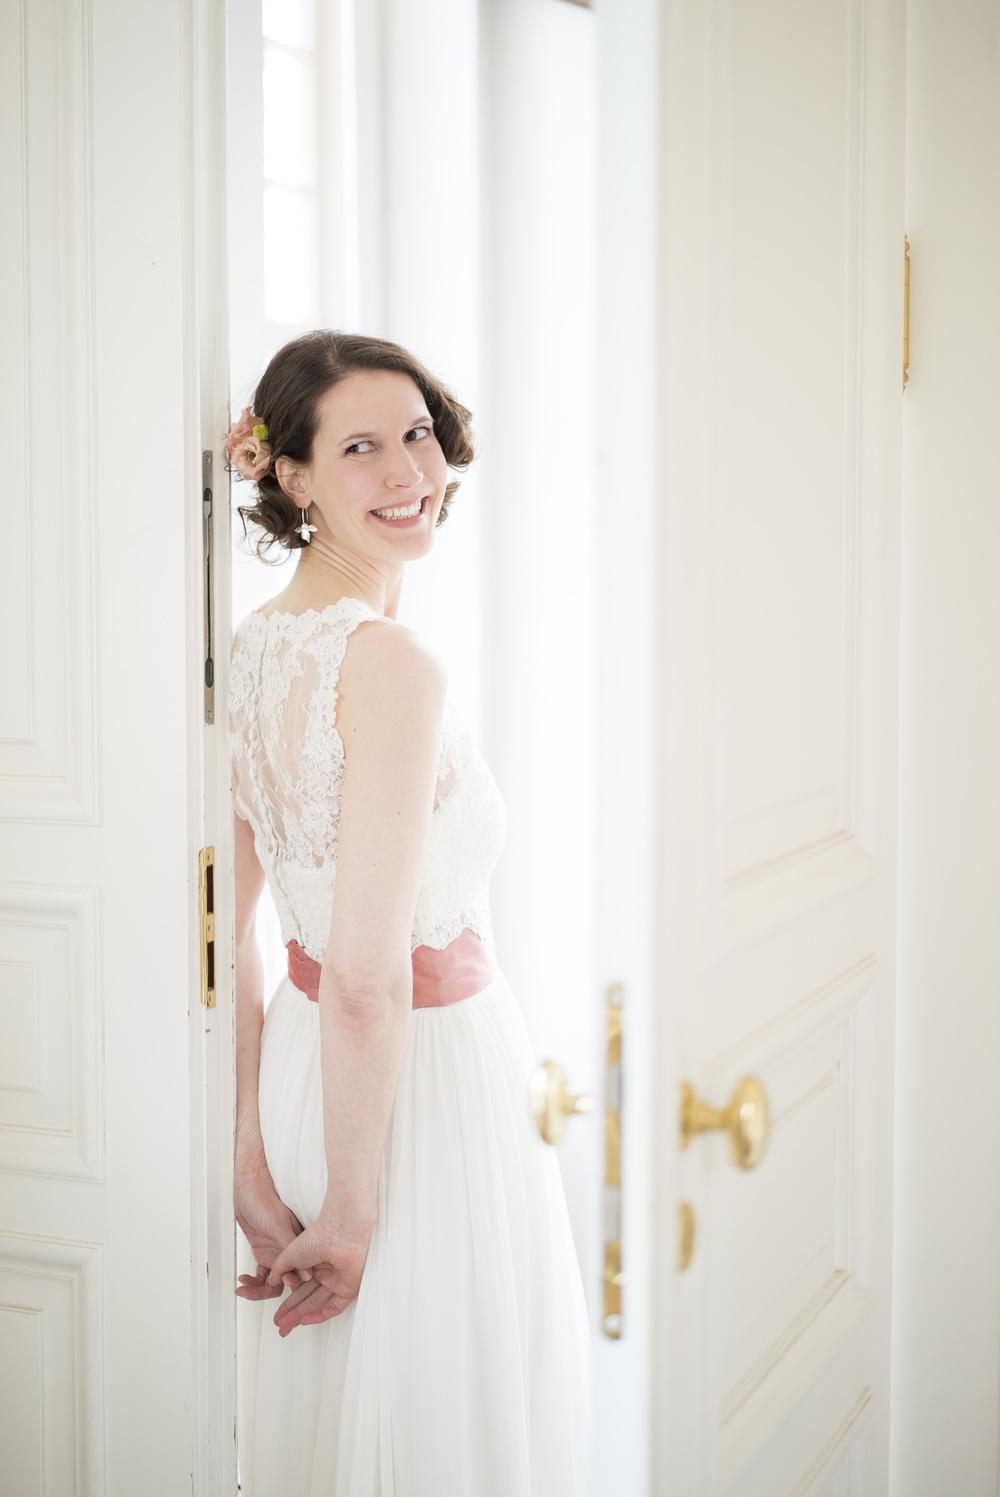 Hochzeitsfotograf-Schlossruine-Hertefeld-Weeze-007.jpg